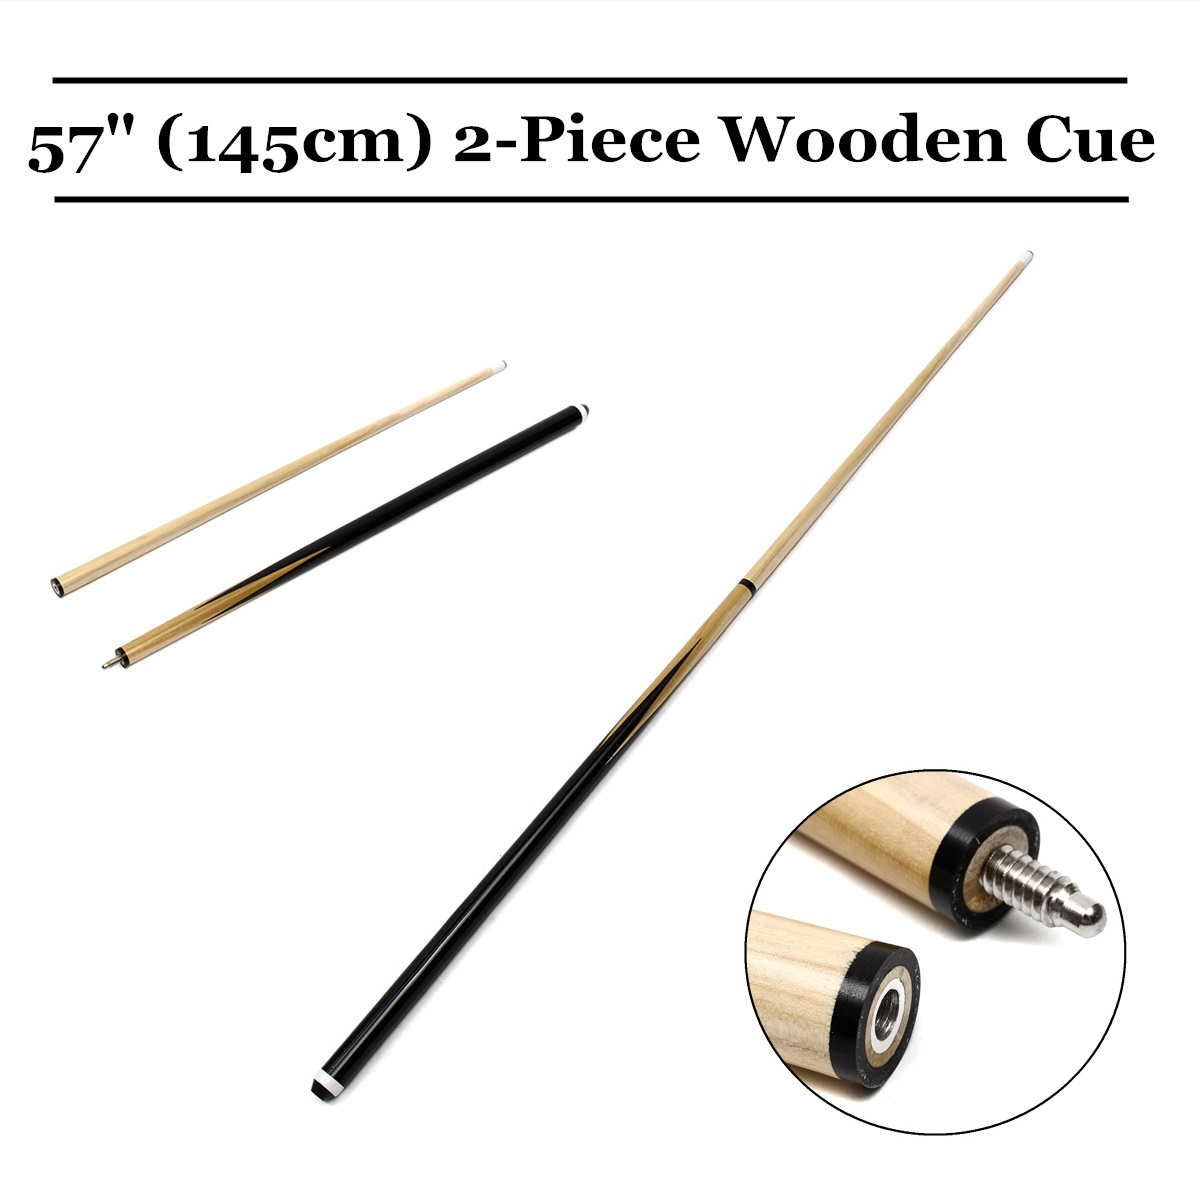 1Pcs Wooden 145cm 1/2 Structure Pool Cue Billiard House Bar Pool Cue Sticks Entertainment Snooker Accessories Billiard Tools